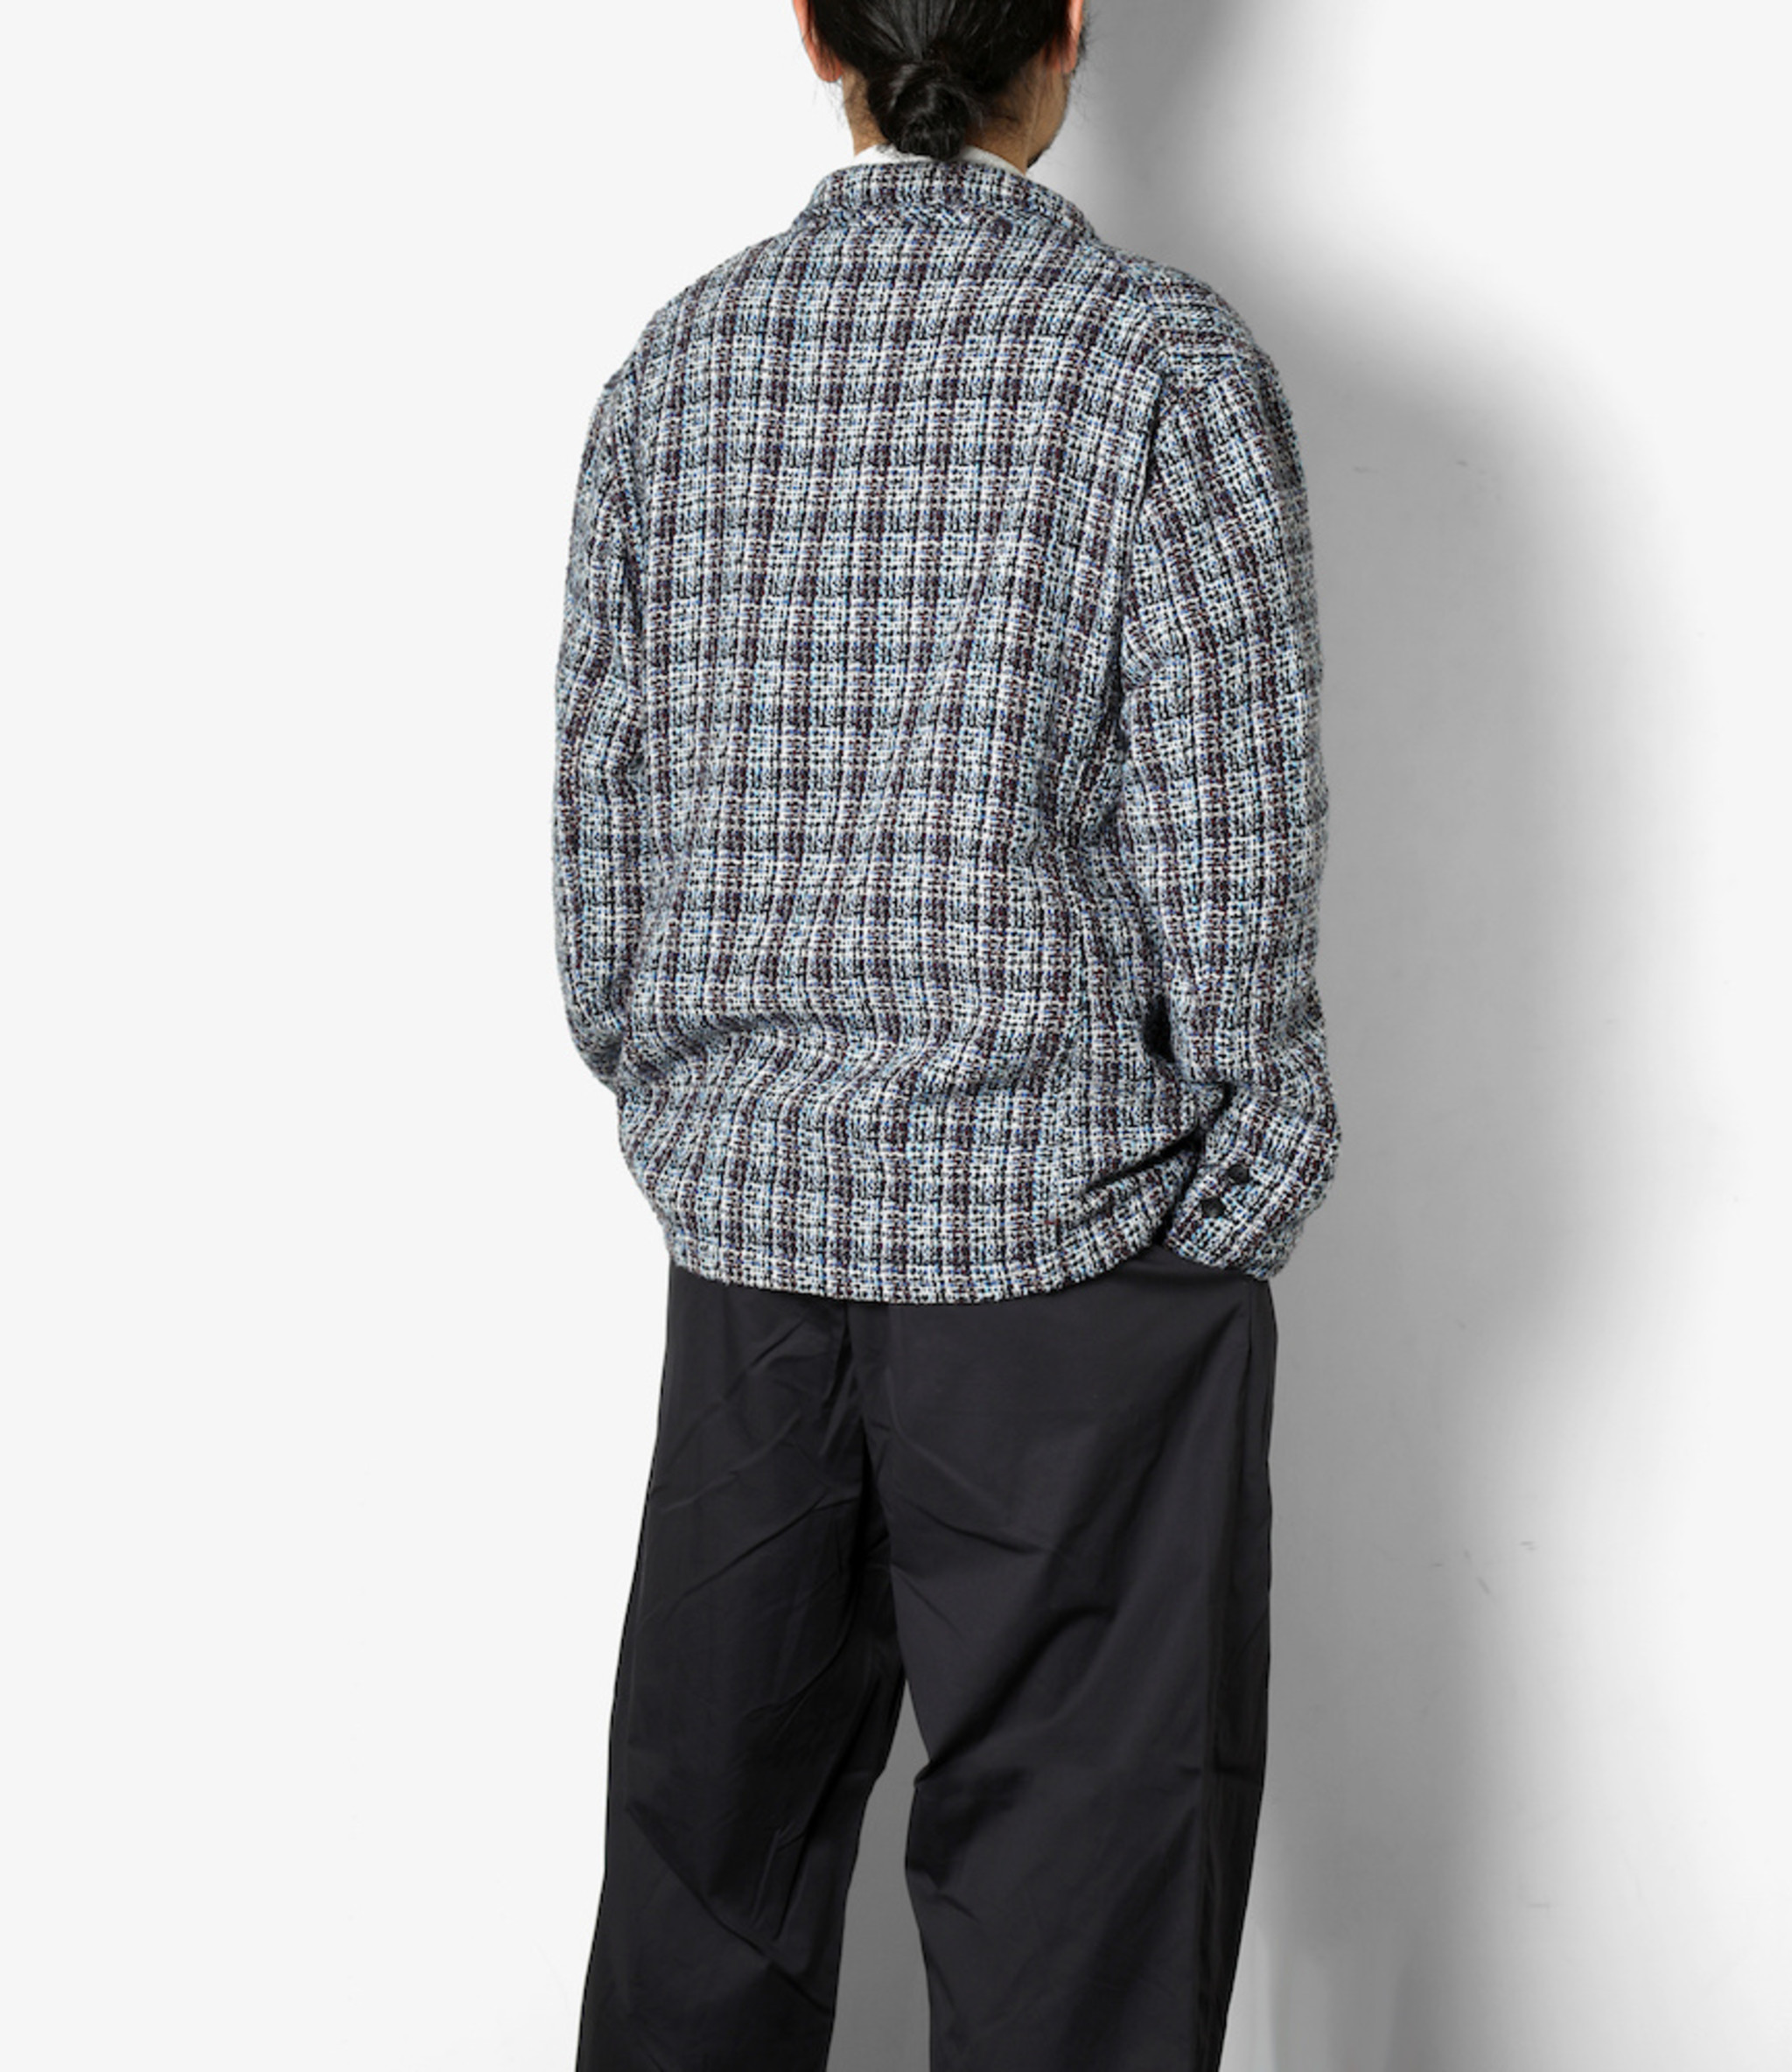 Engineered Garments NB Jacket - Blue Cotton Poly Tweed